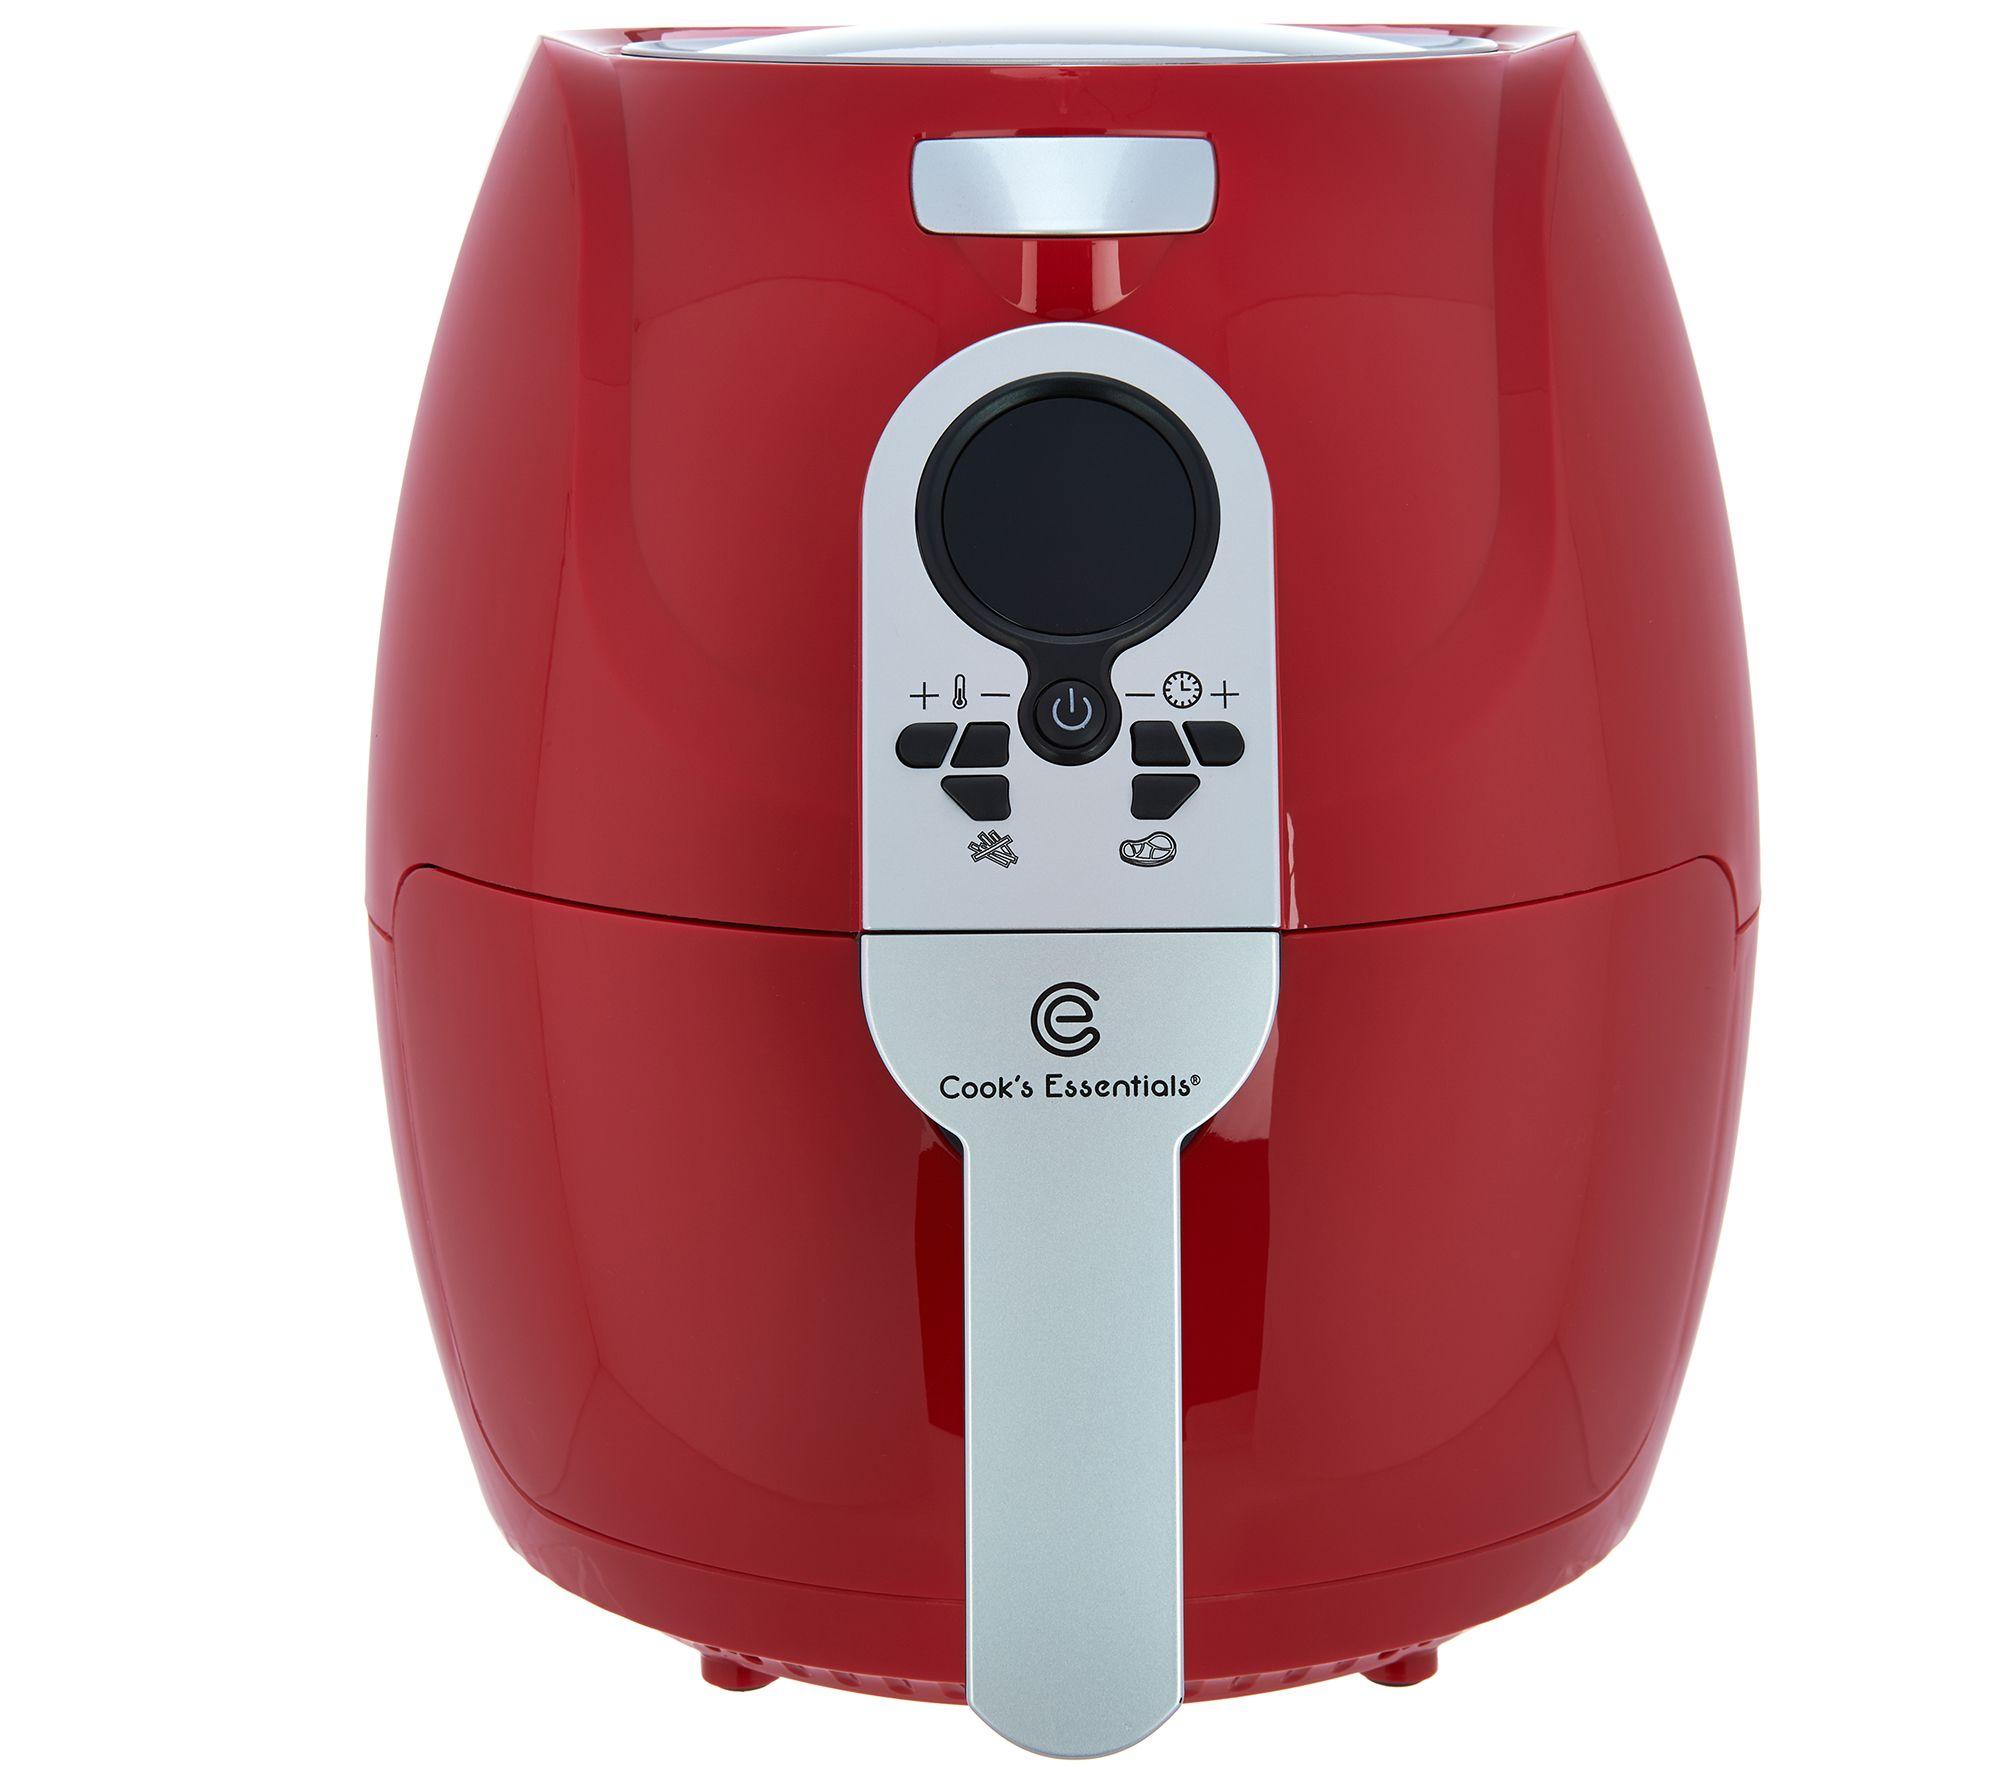 Kitchen small appliance essentials - Cook S Essentials 2 4 Qt Digital Air Fryer W 2 Presets K45575